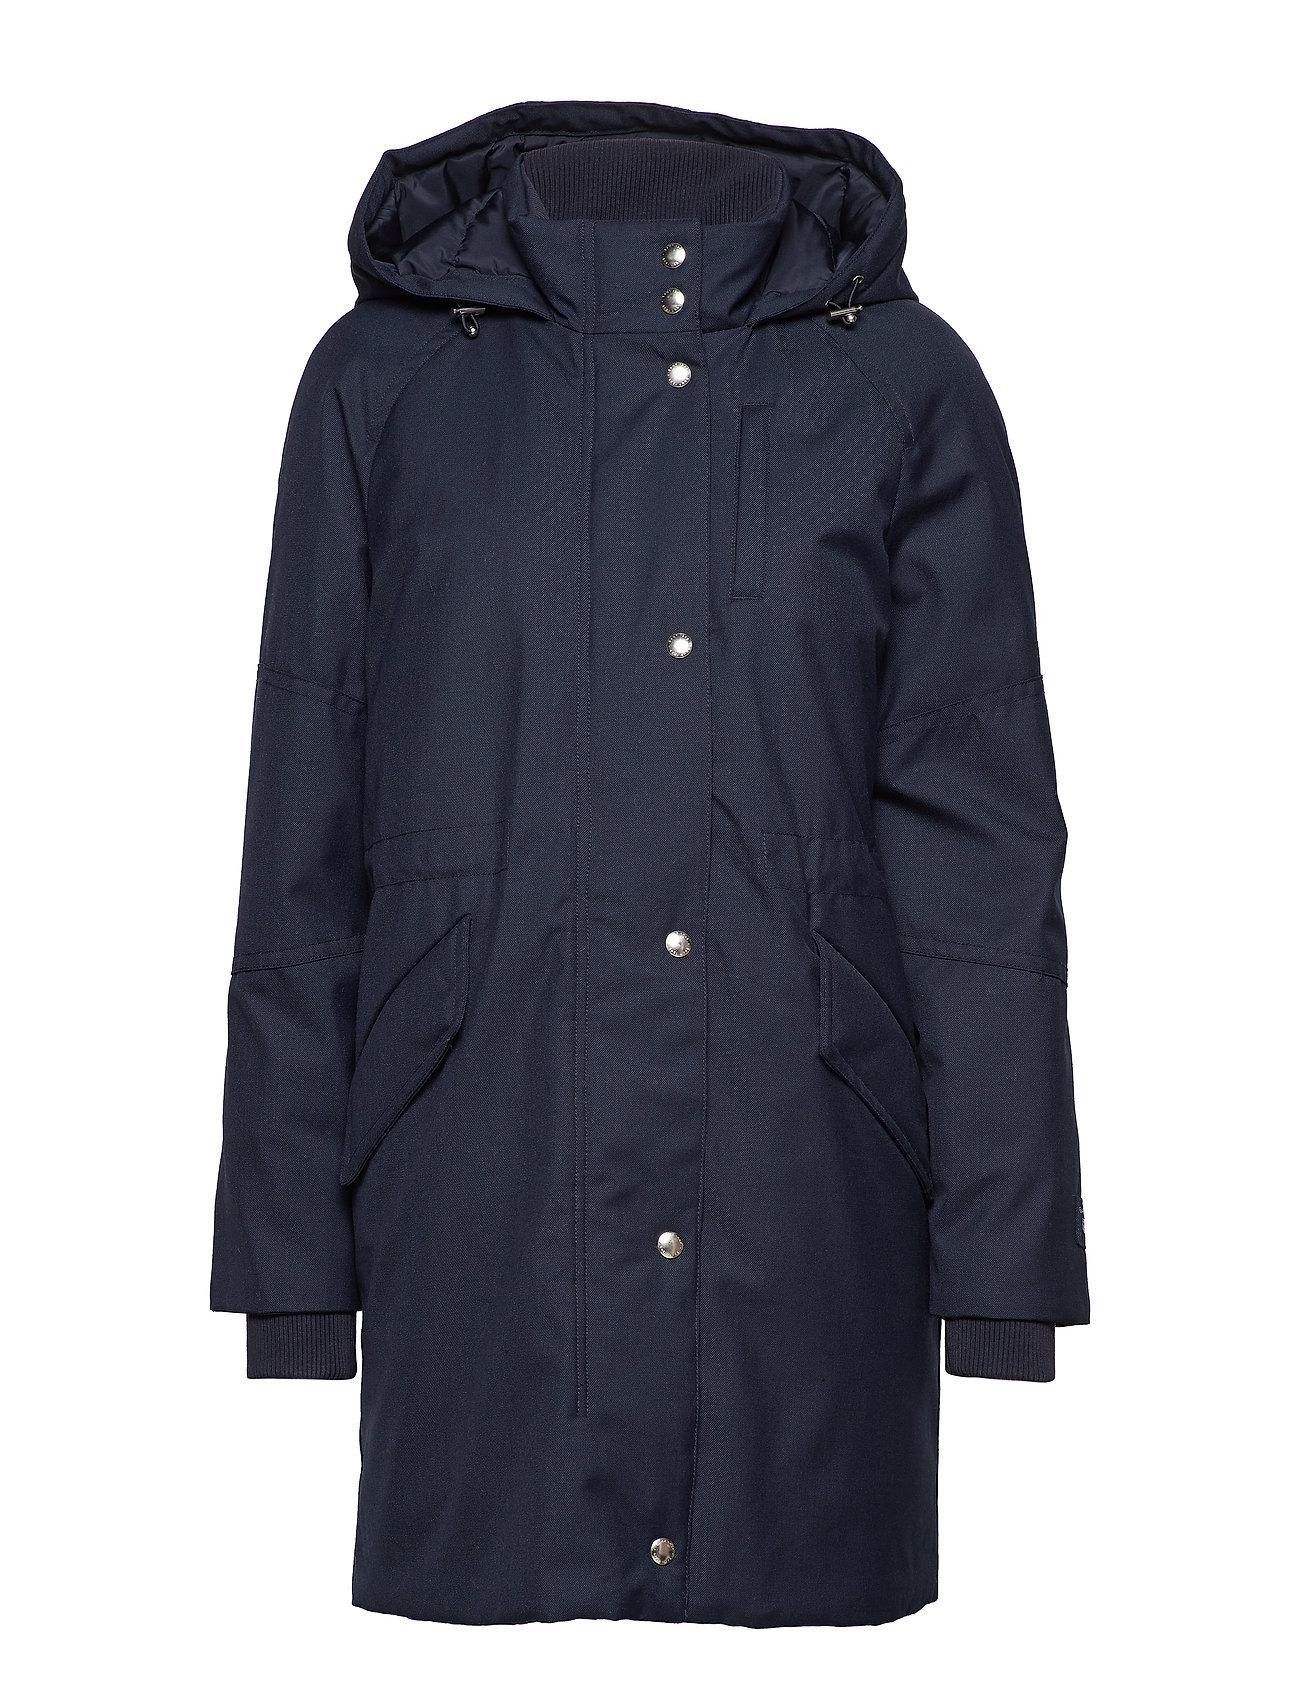 Gant O1. Technical Wool Down Parka - Jackor & Kappor